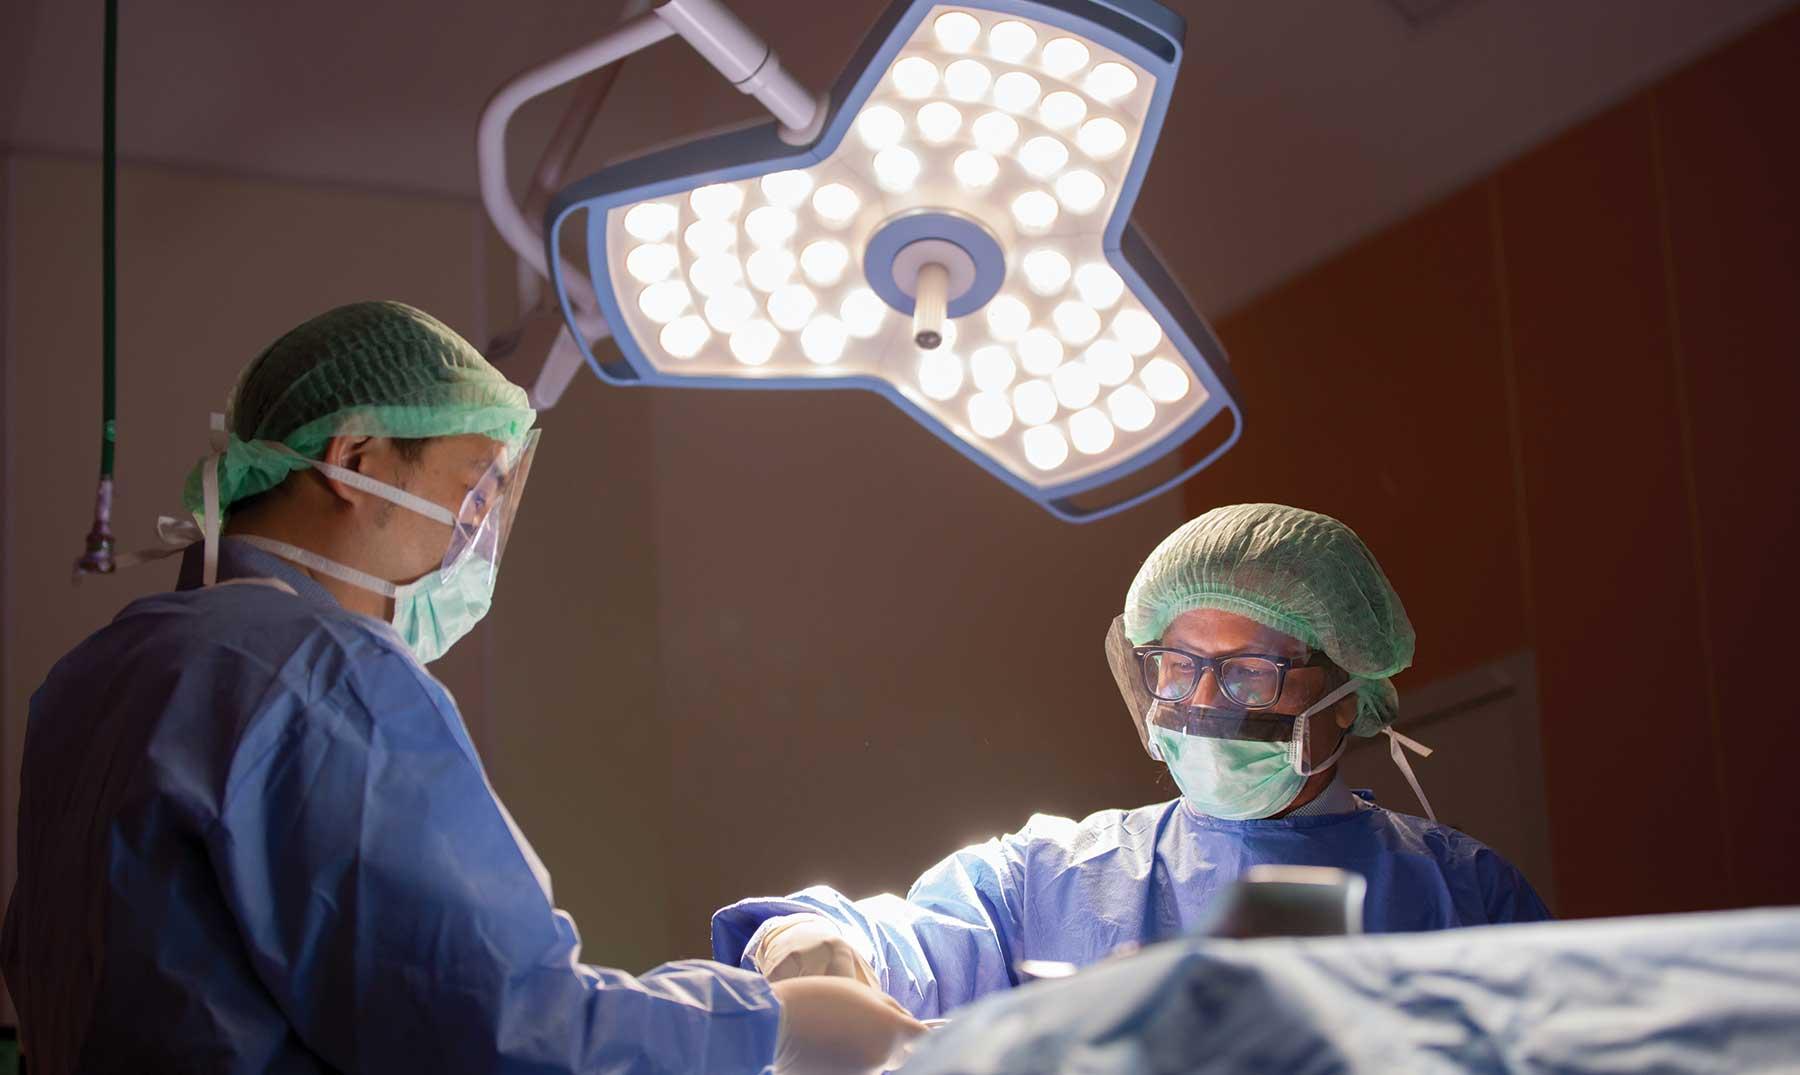 Histerectomía y anexectomía por laparoscopia